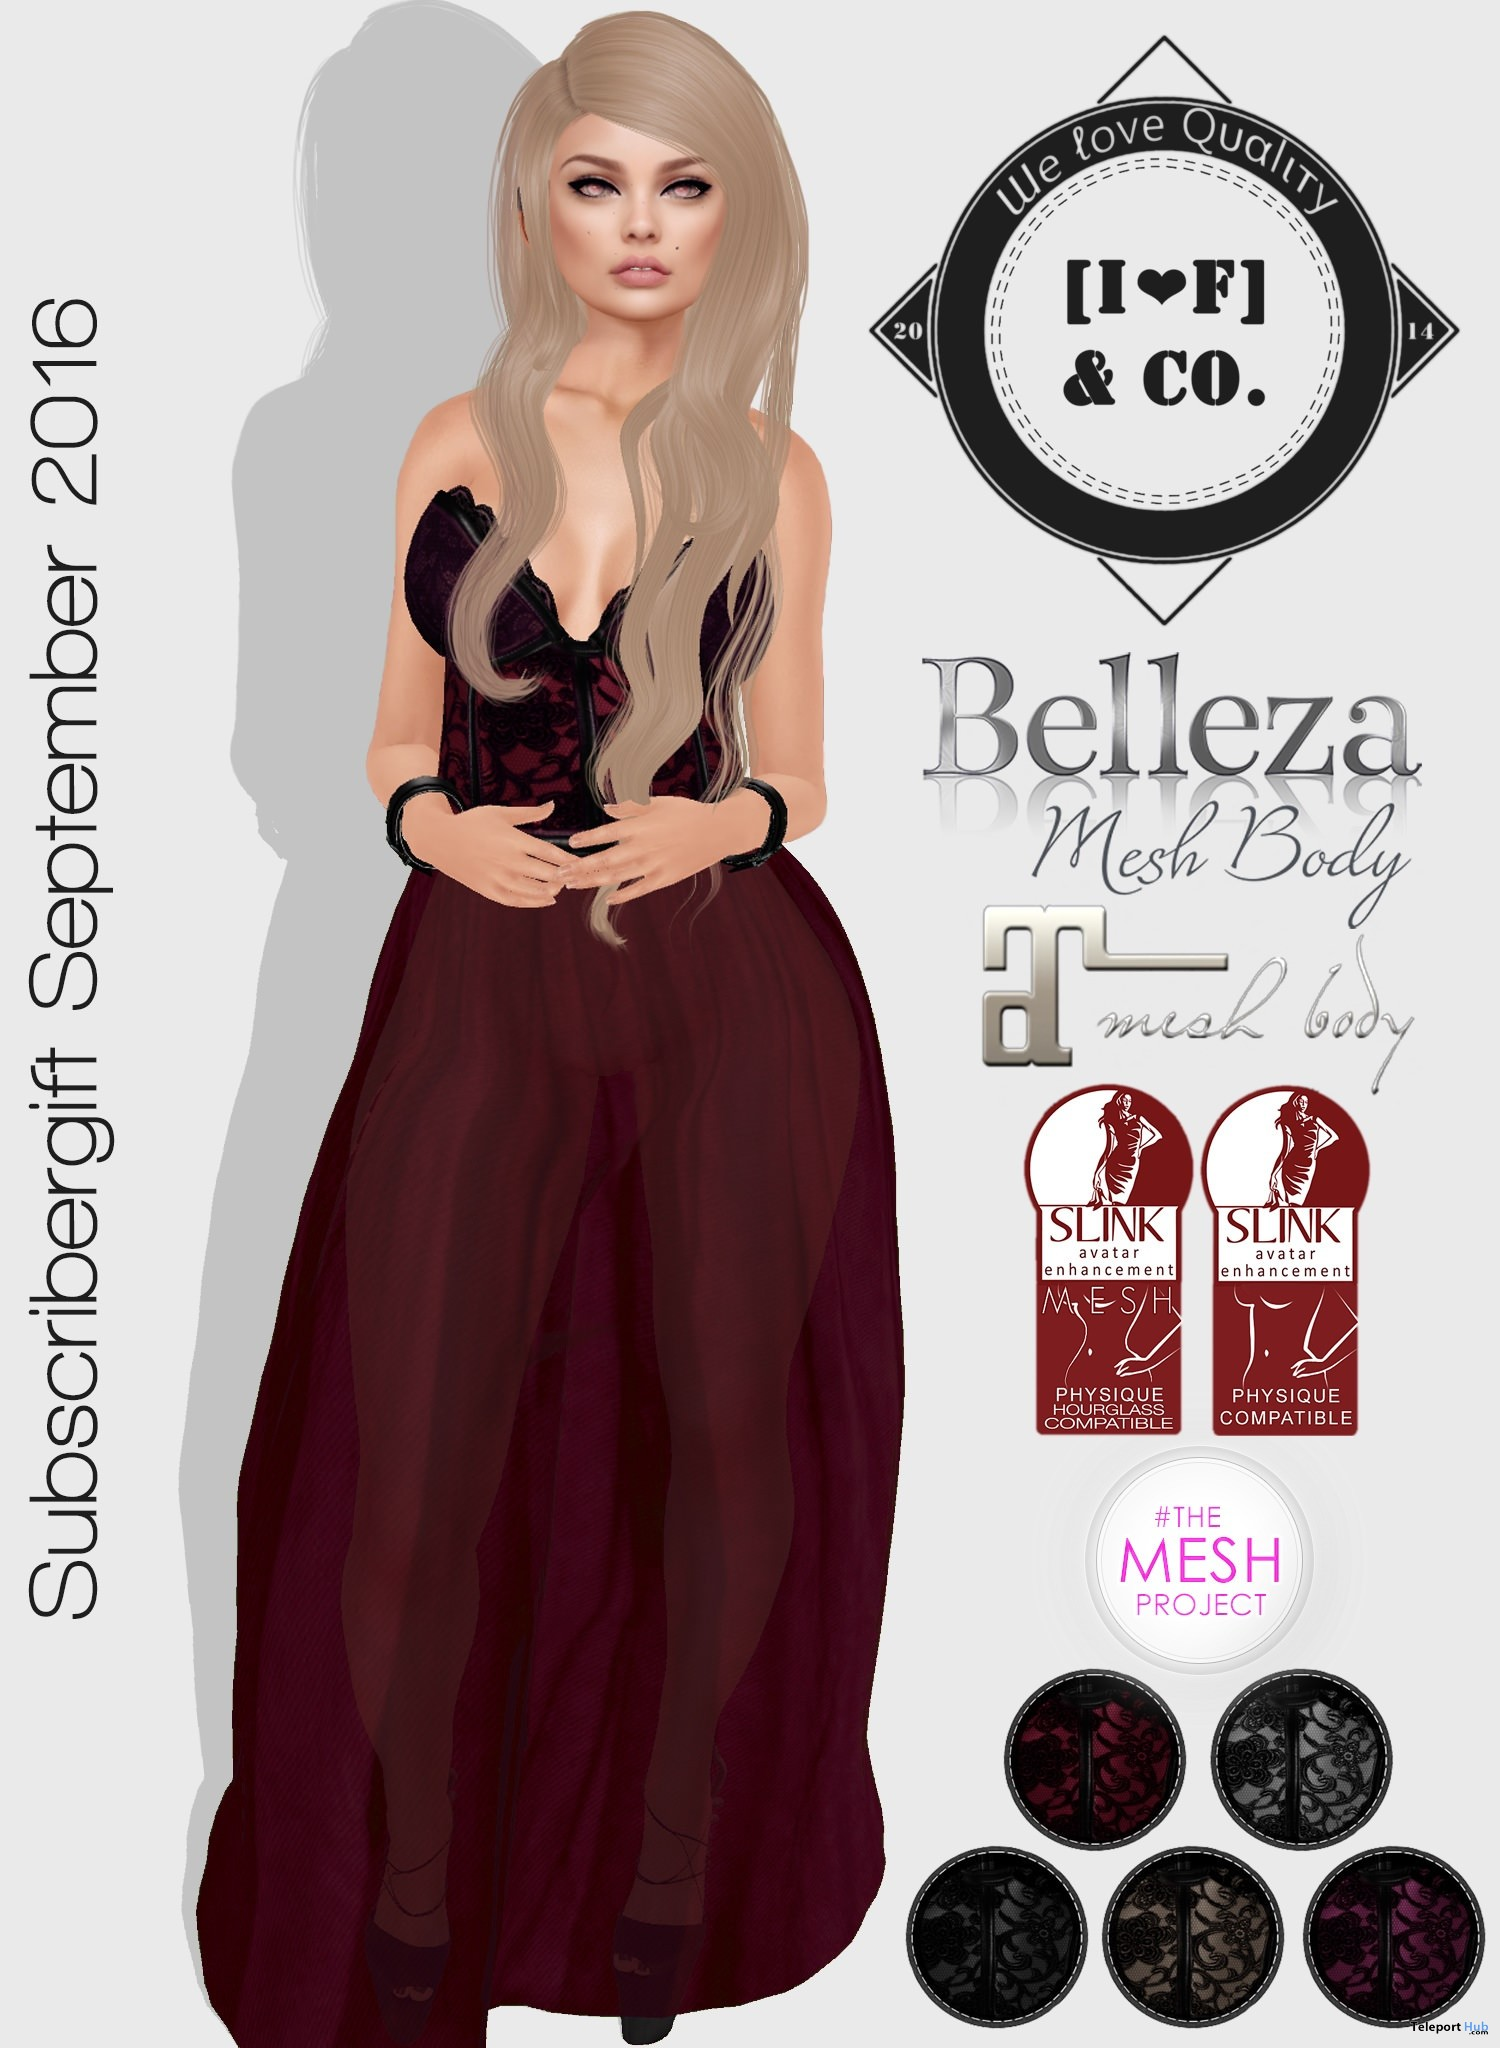 Long Dress 5 Colors September 2016 Subscriber Gift by I<3F & Co - Teleport Hub - teleporthub.com